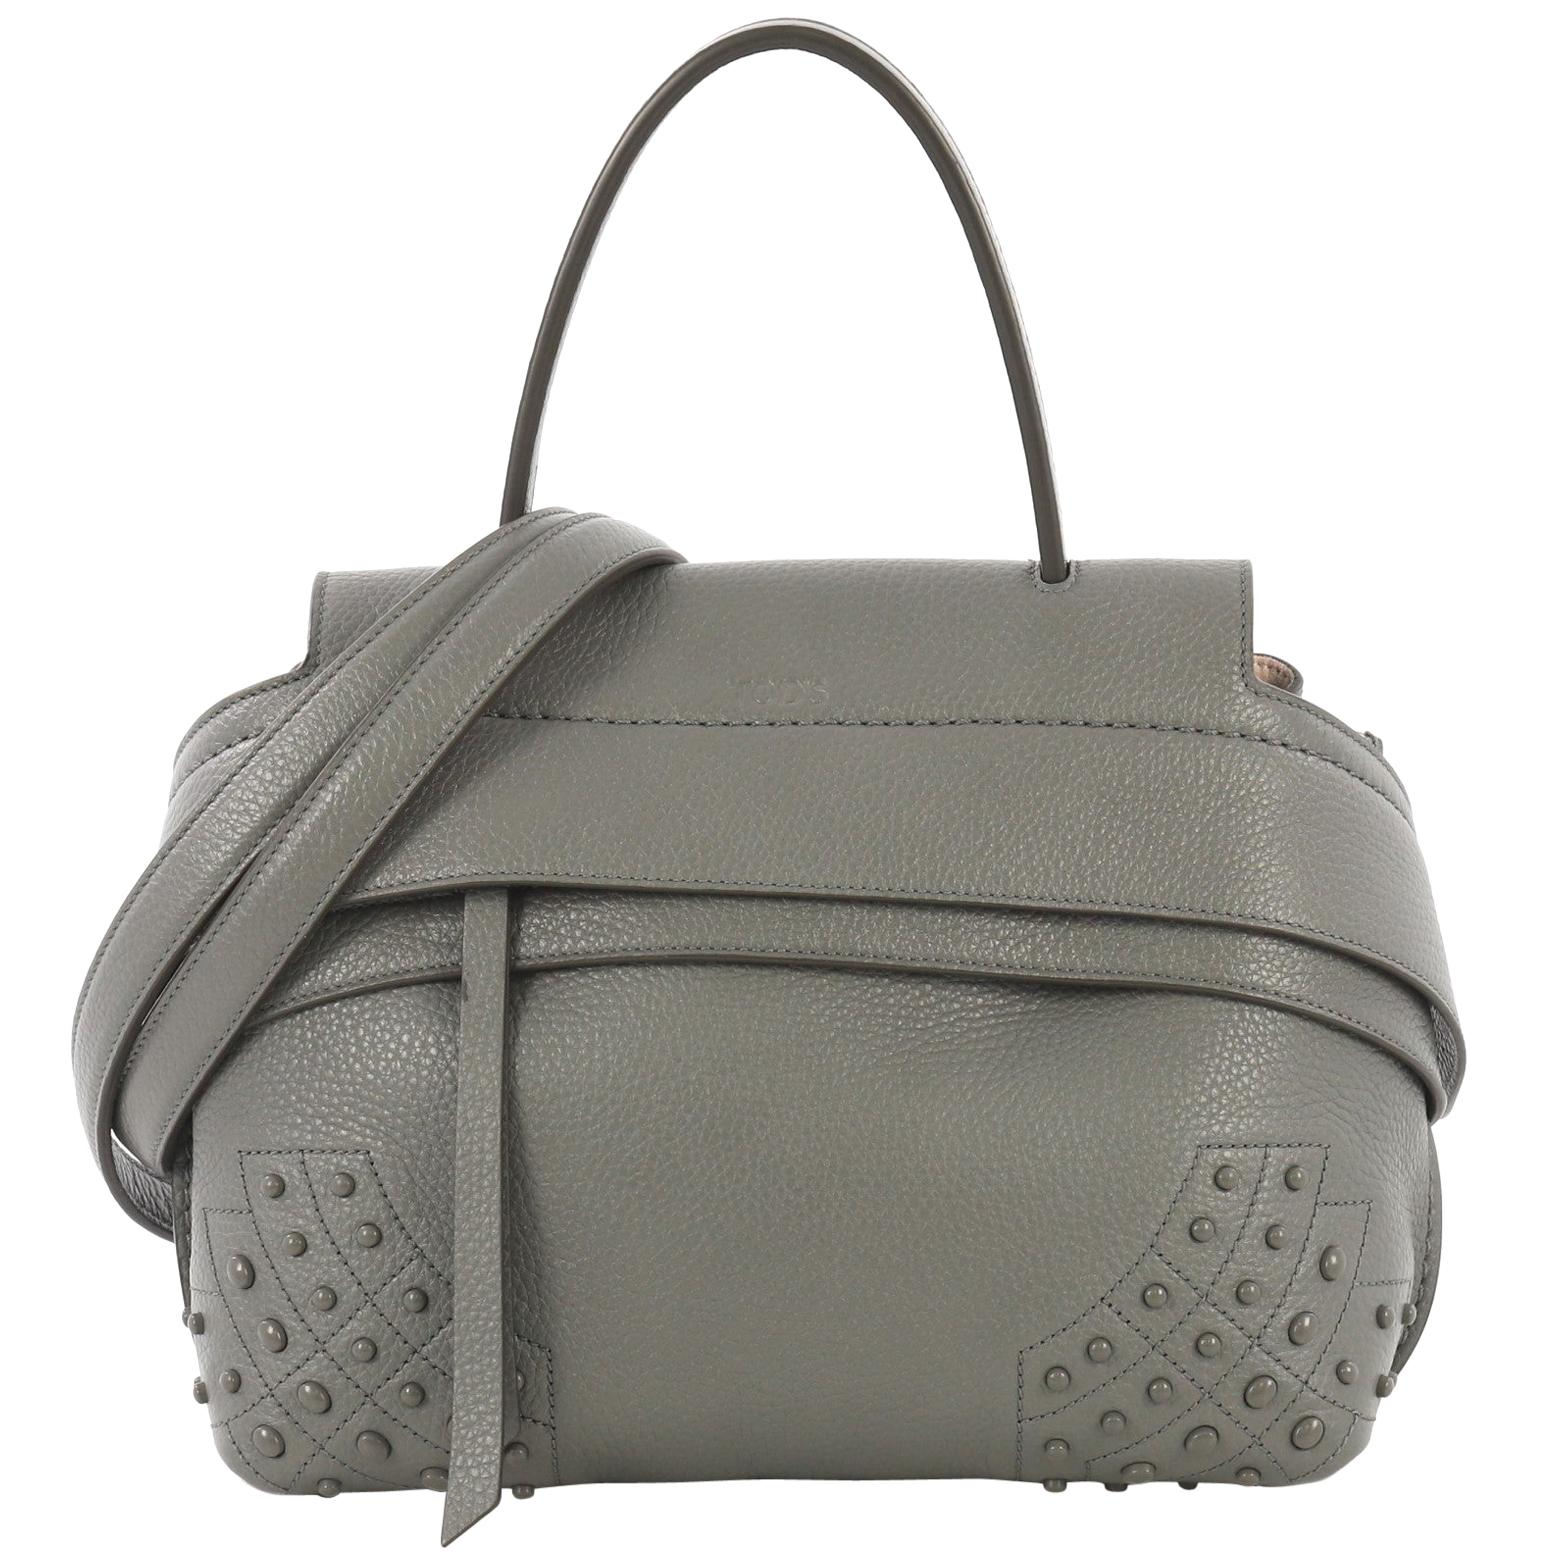 b3edc45d5f Tod's Dark Brown Leather T Bag Media Satchel For Sale at 1stdibs